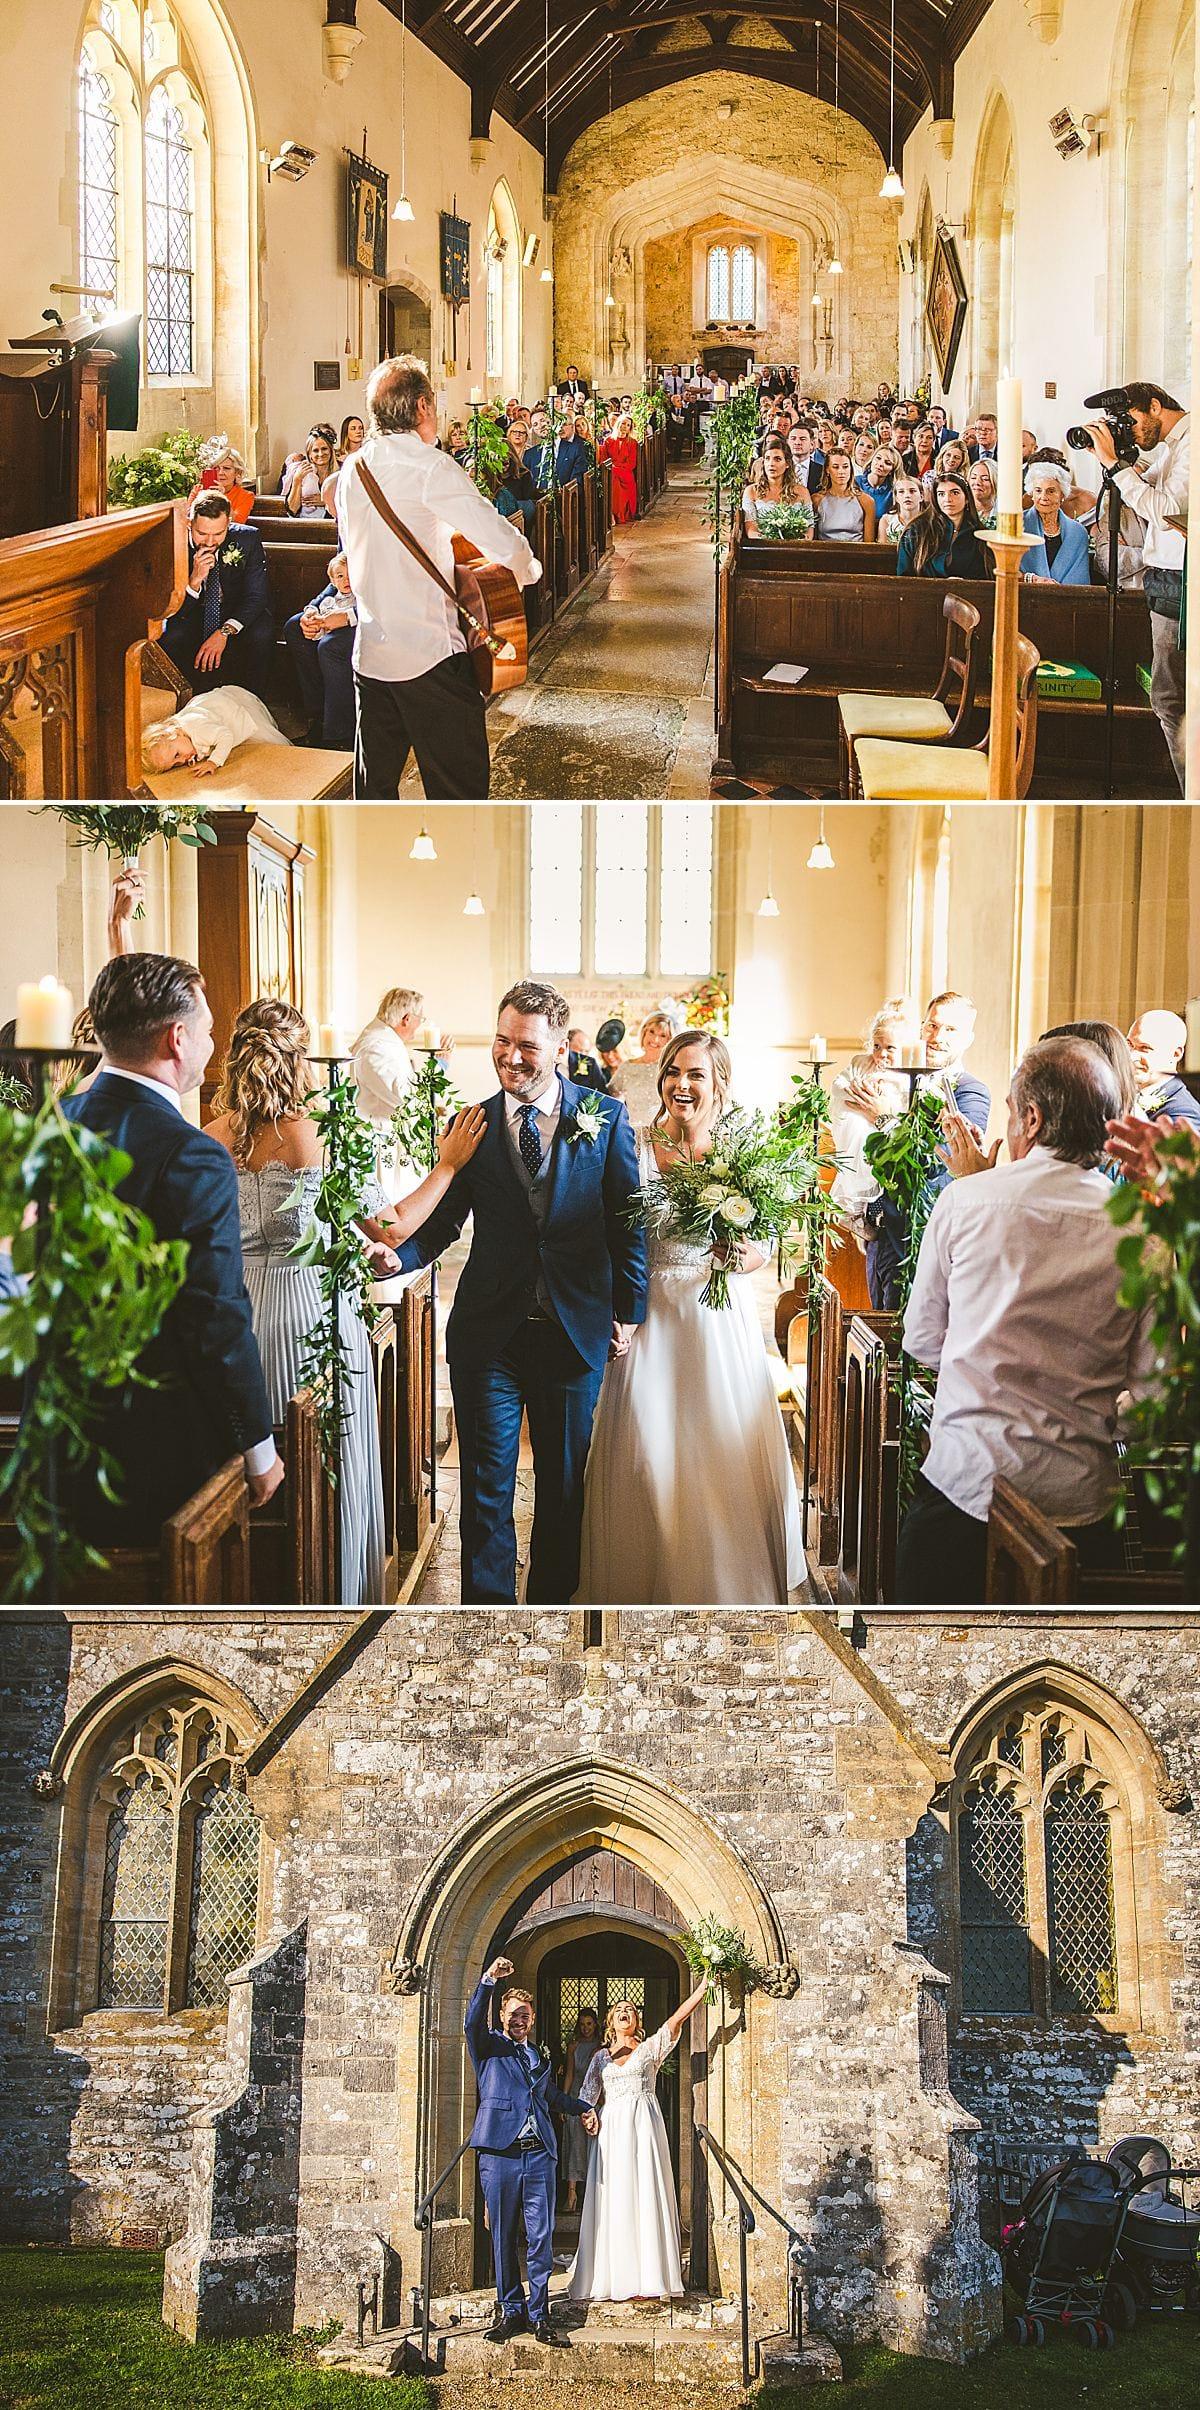 Church wedding Lulworth Castle Dorset